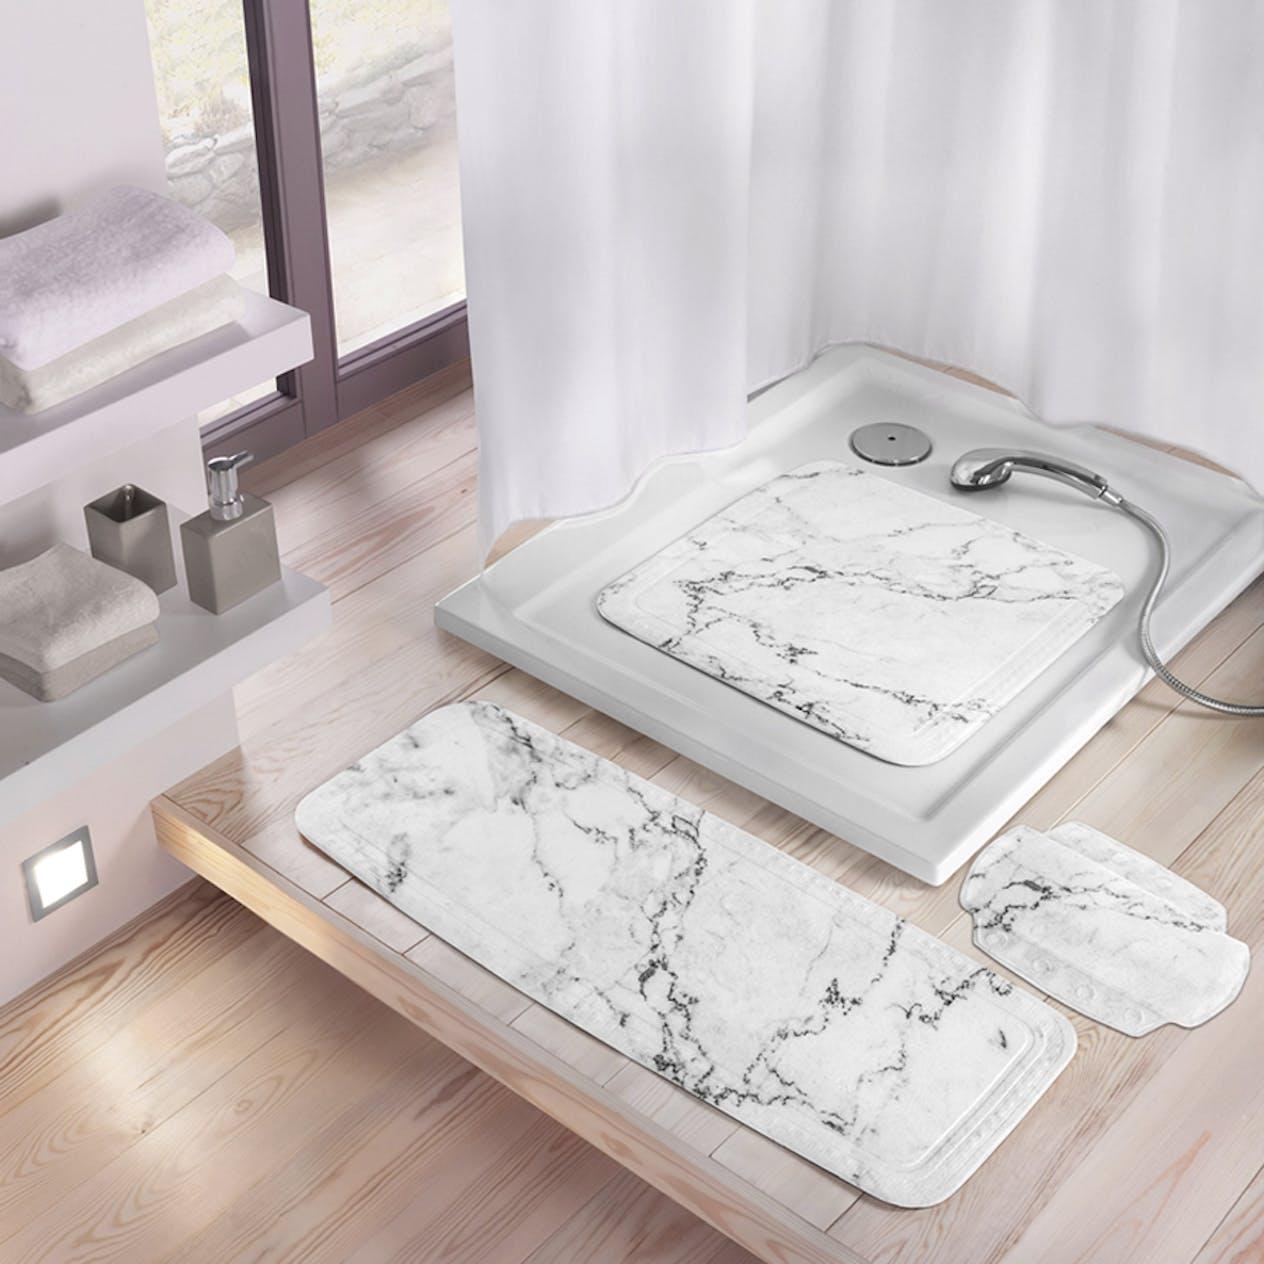 Halkmatta Kleine Wolke Marble för dusch 4102901002 76a0e0e5818f5